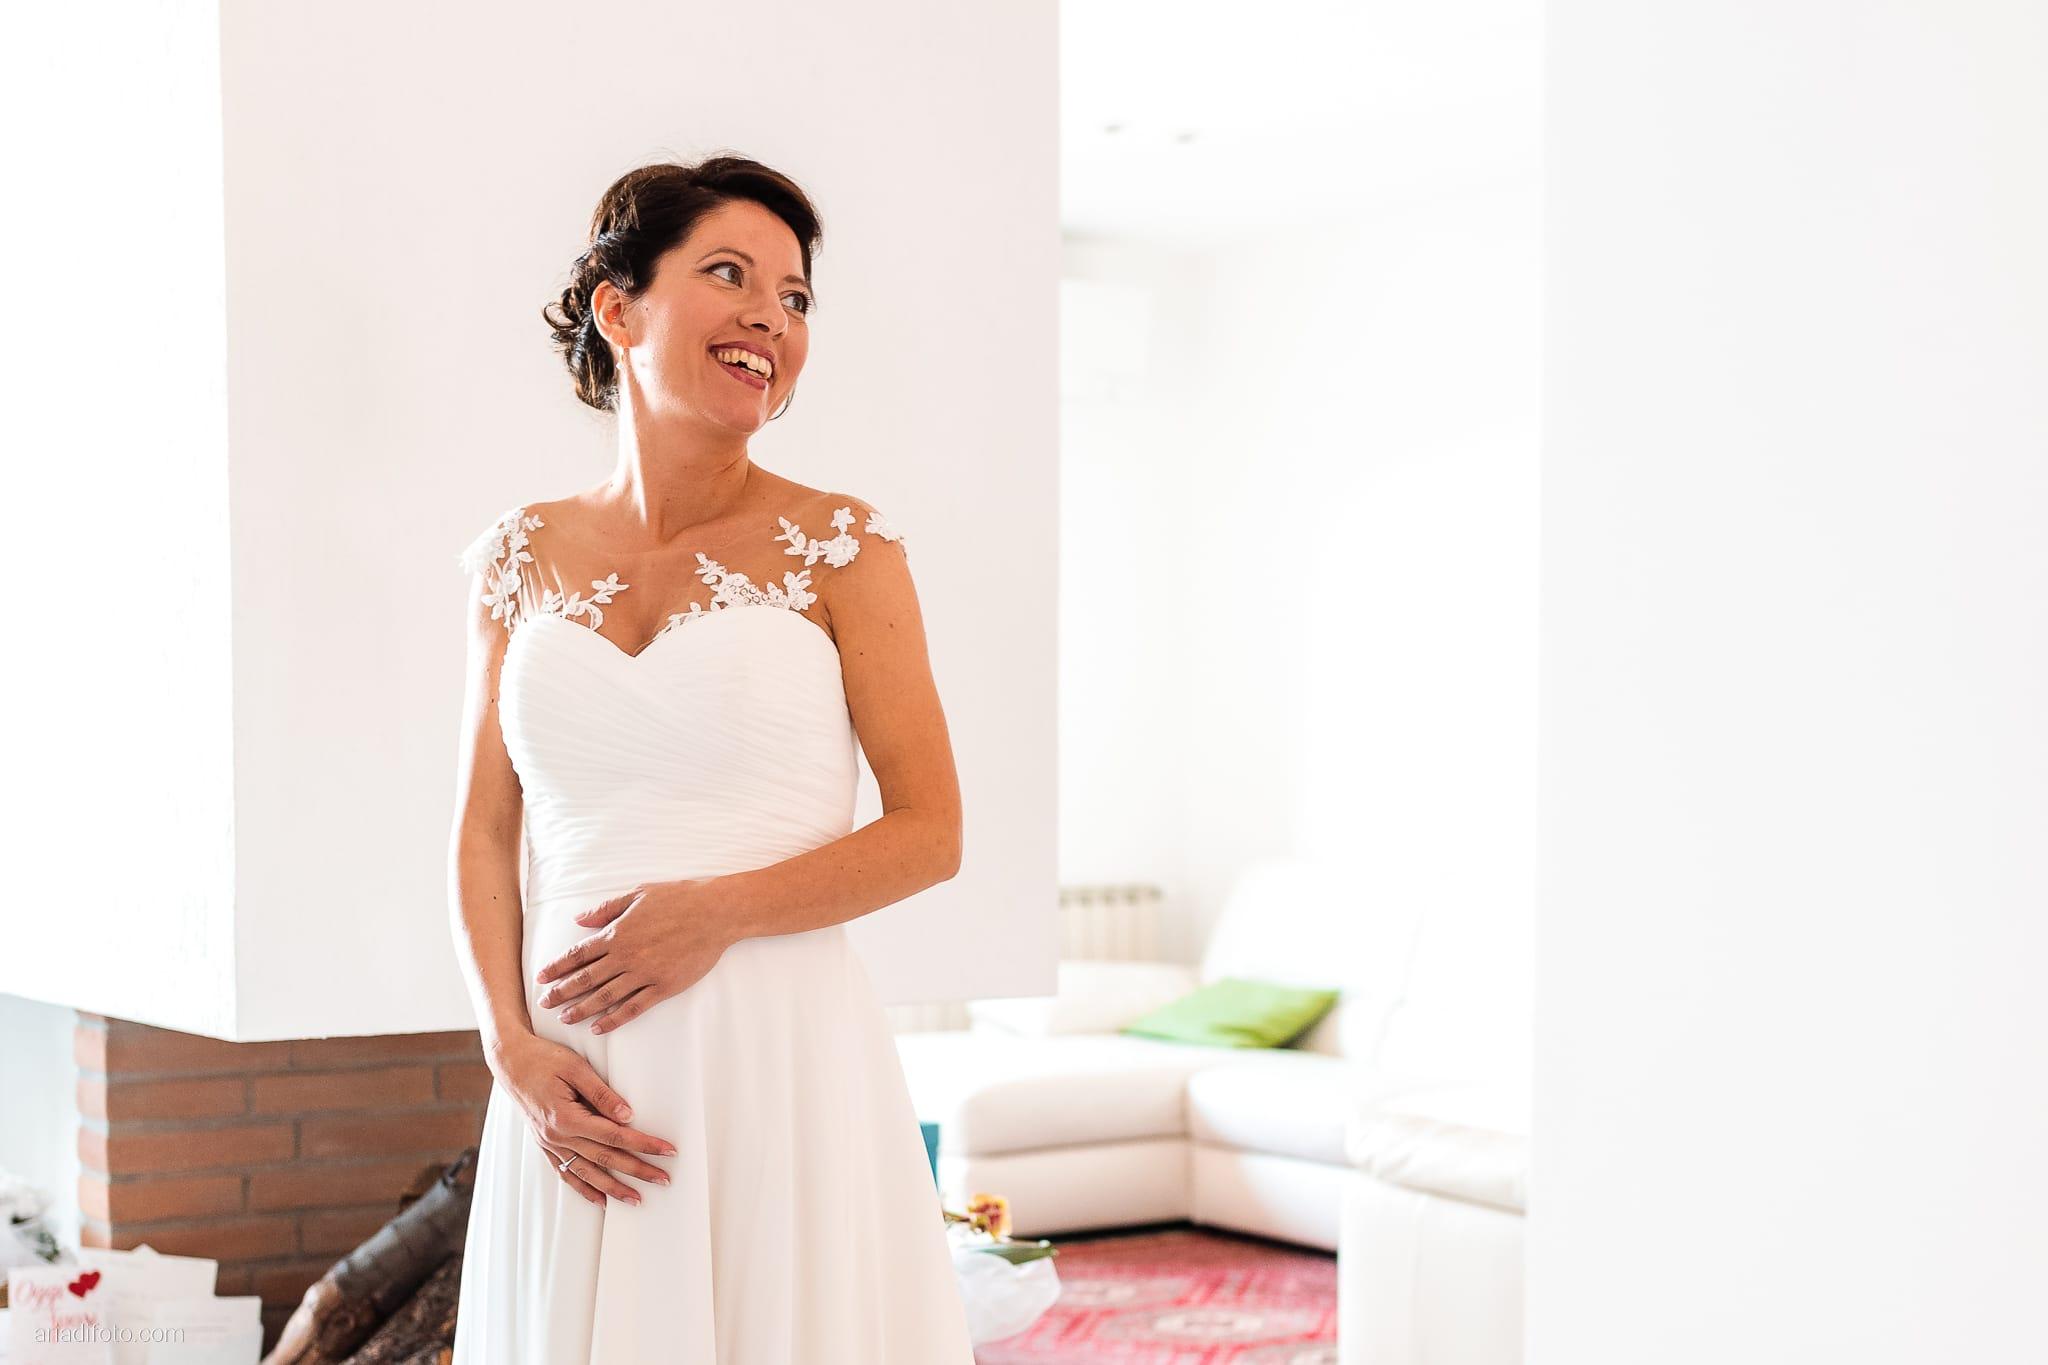 Tatiana Marco Matrimonio Trieste Baronesse Tacco San Floriano Collio Gorizia preparativi sposa